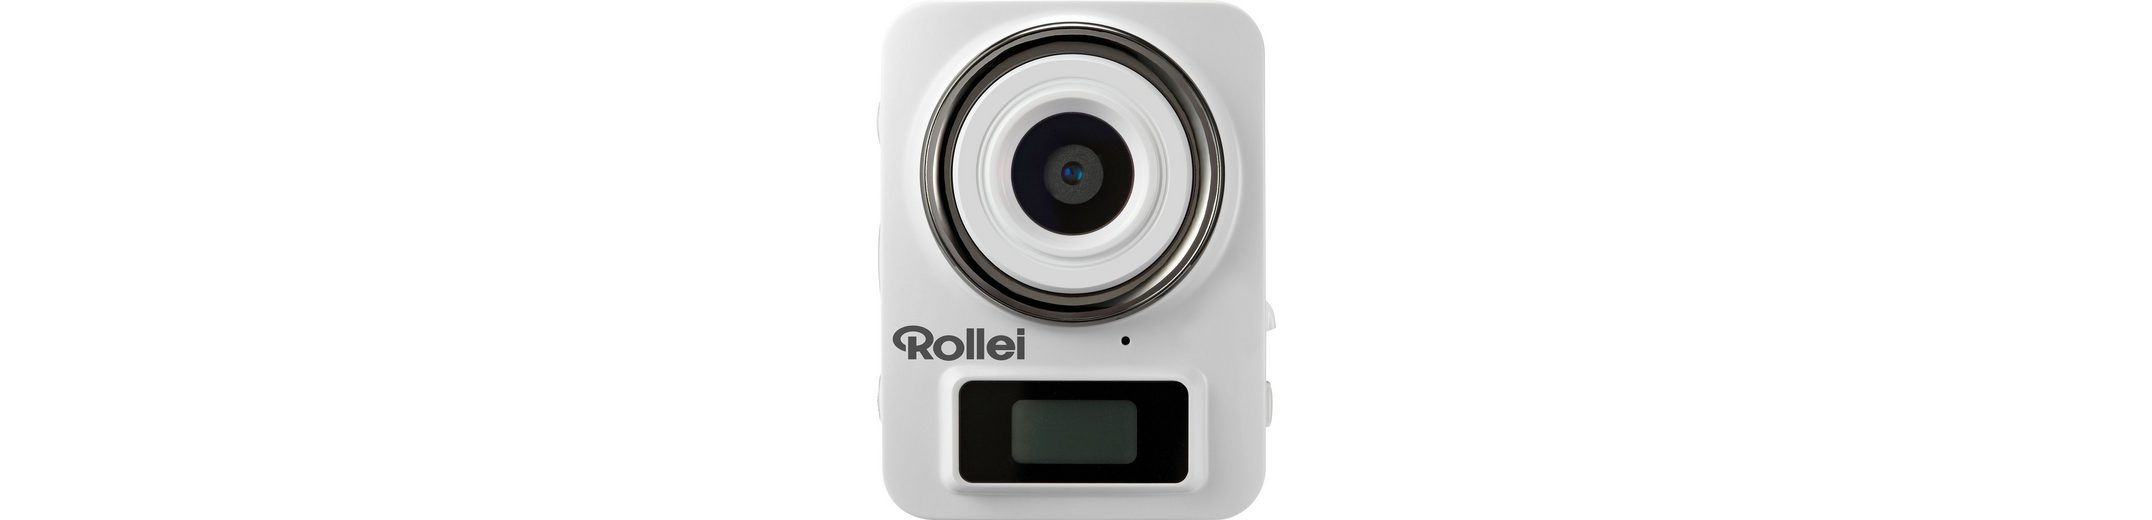 Rollei ADD EYE 1080p (Full HD) Camcorder, WLAN